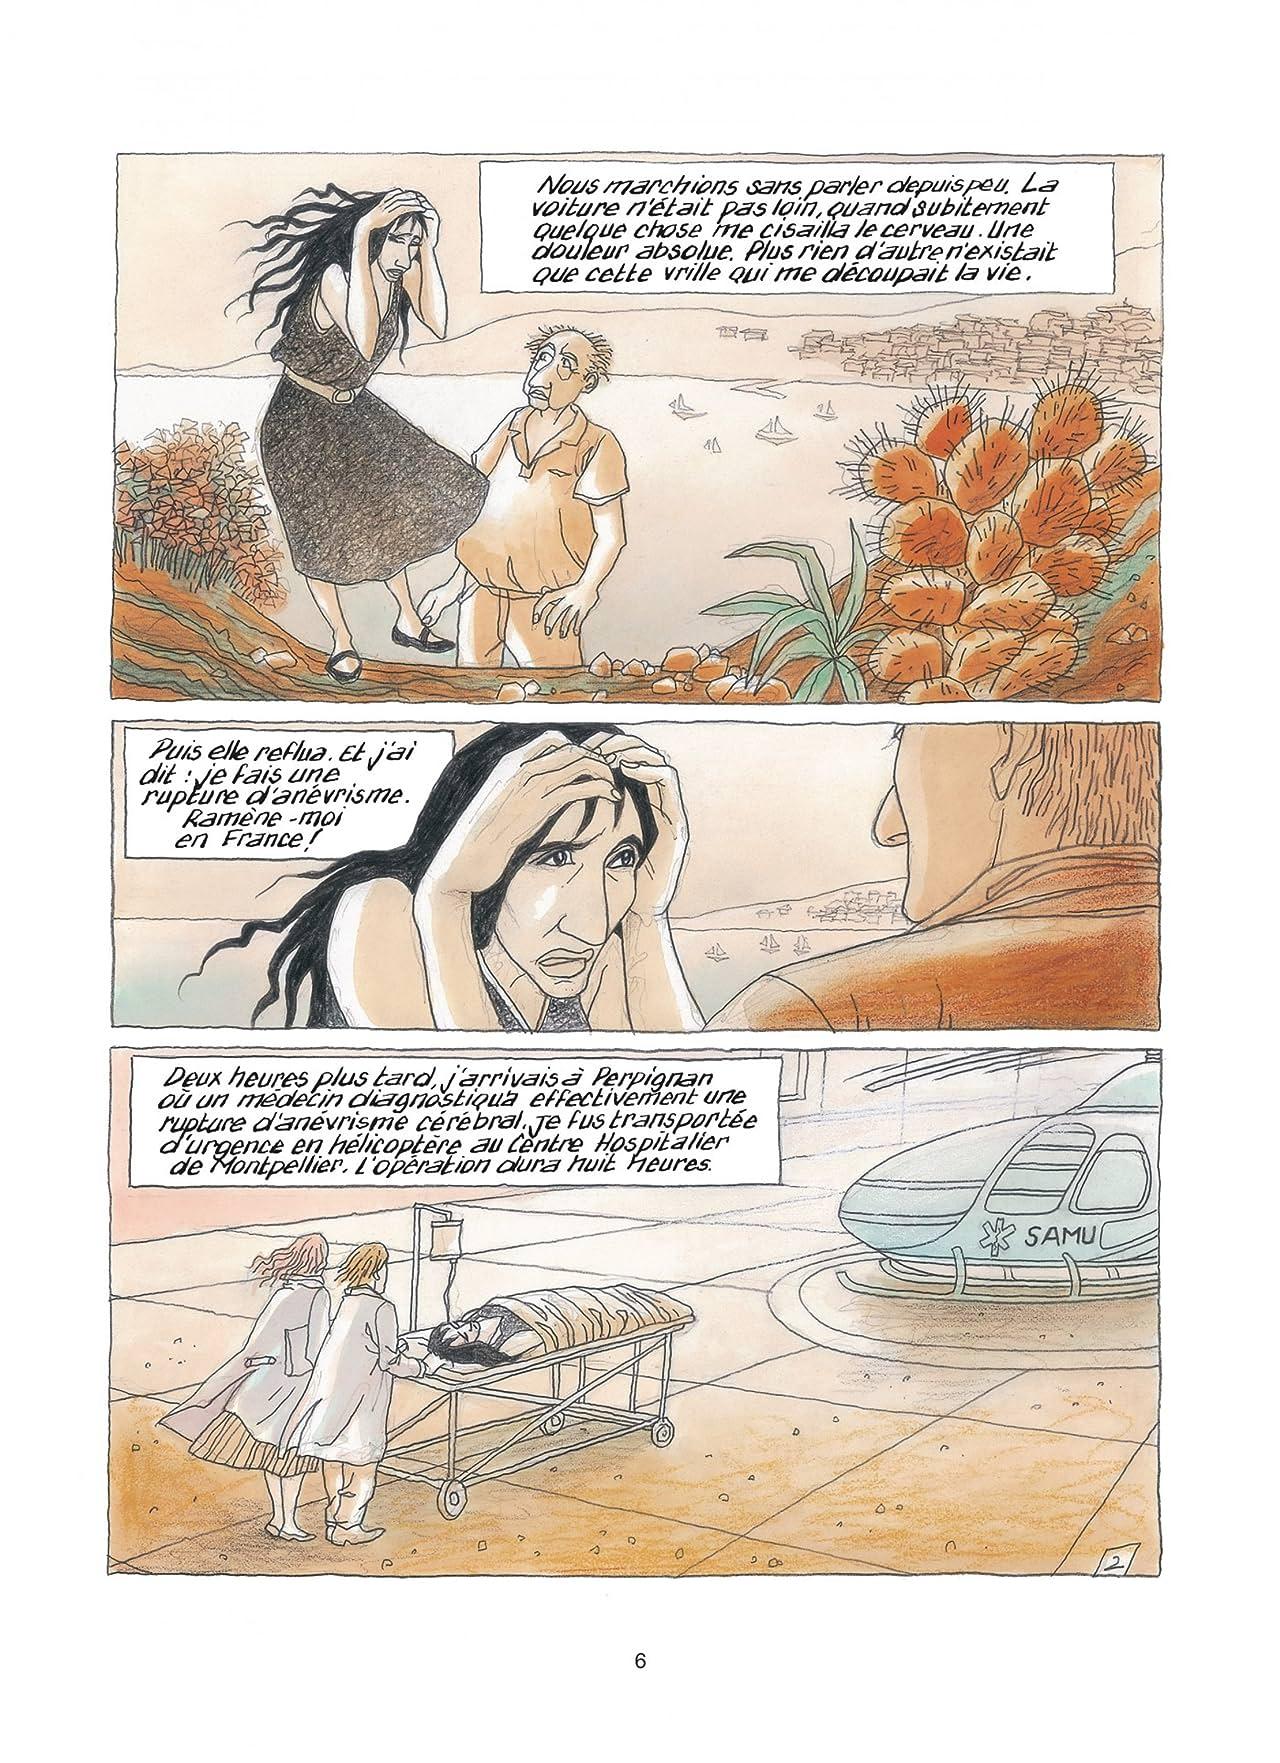 Secrets, Heureuse vie ! Heureux combats ! Vol. 1